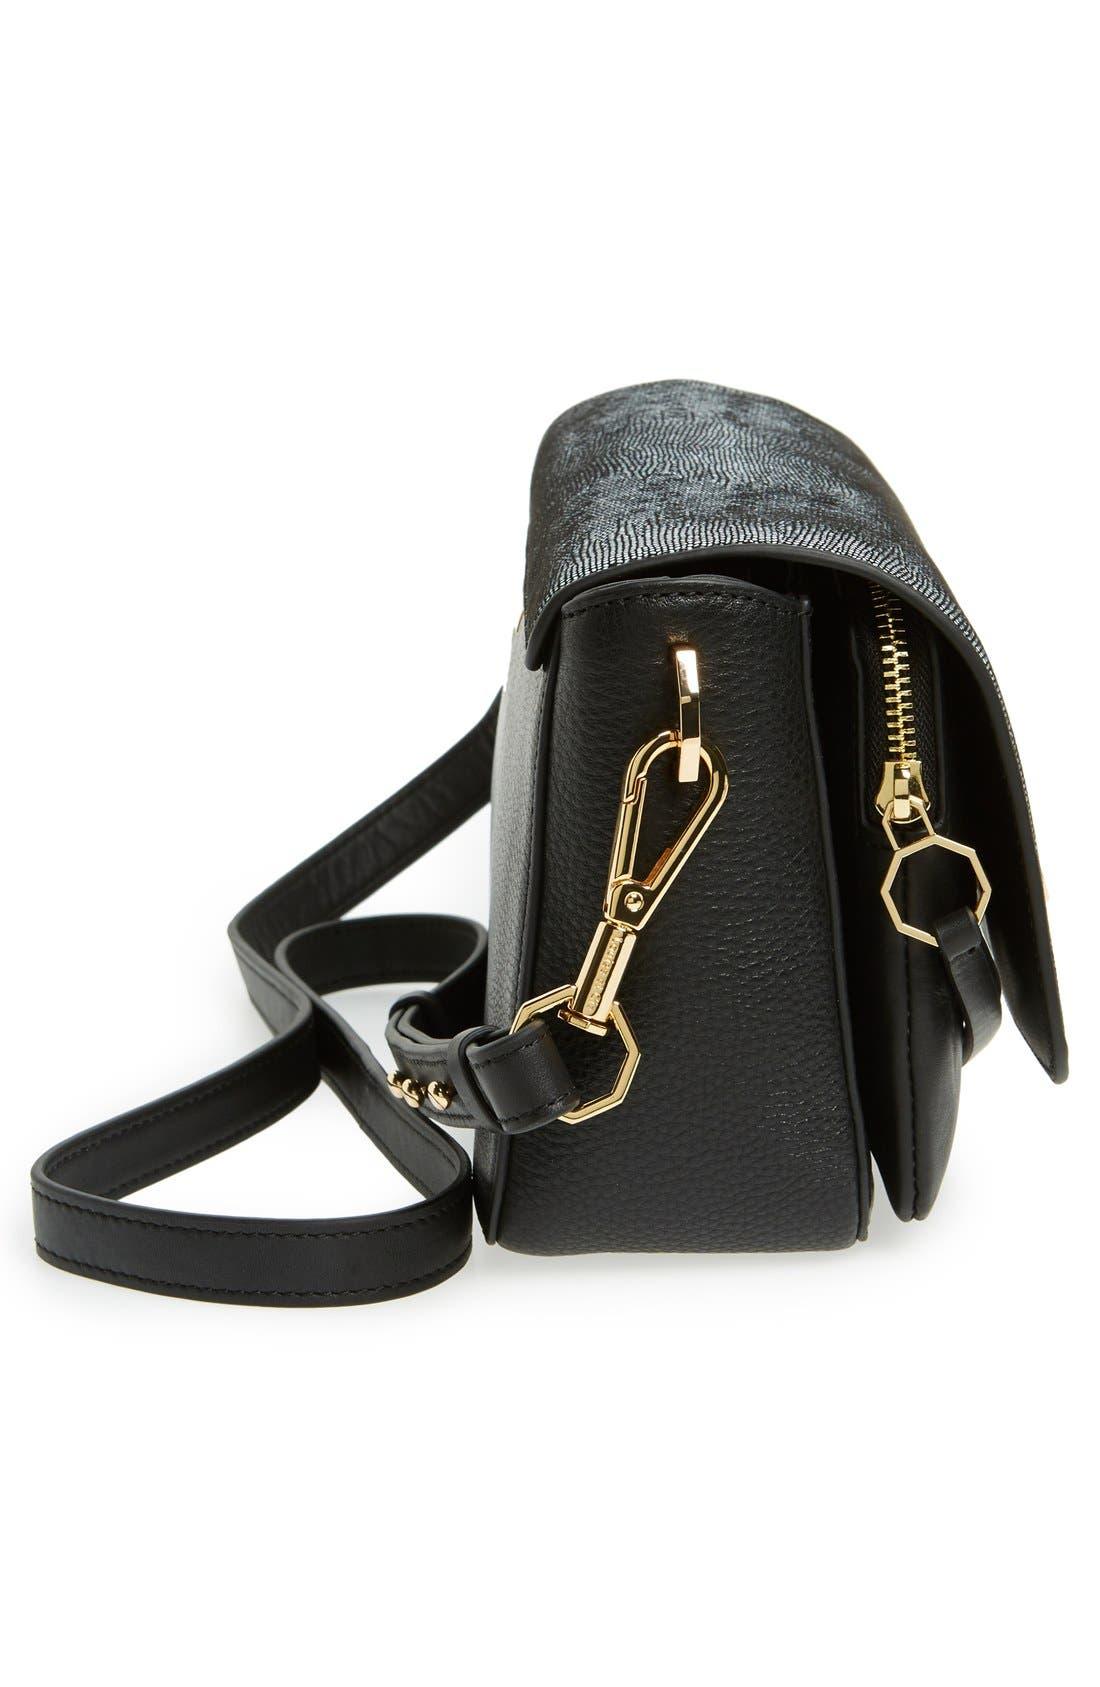 'Small Alis' Leather Crossbody Bag,                             Alternate thumbnail 4, color,                             001